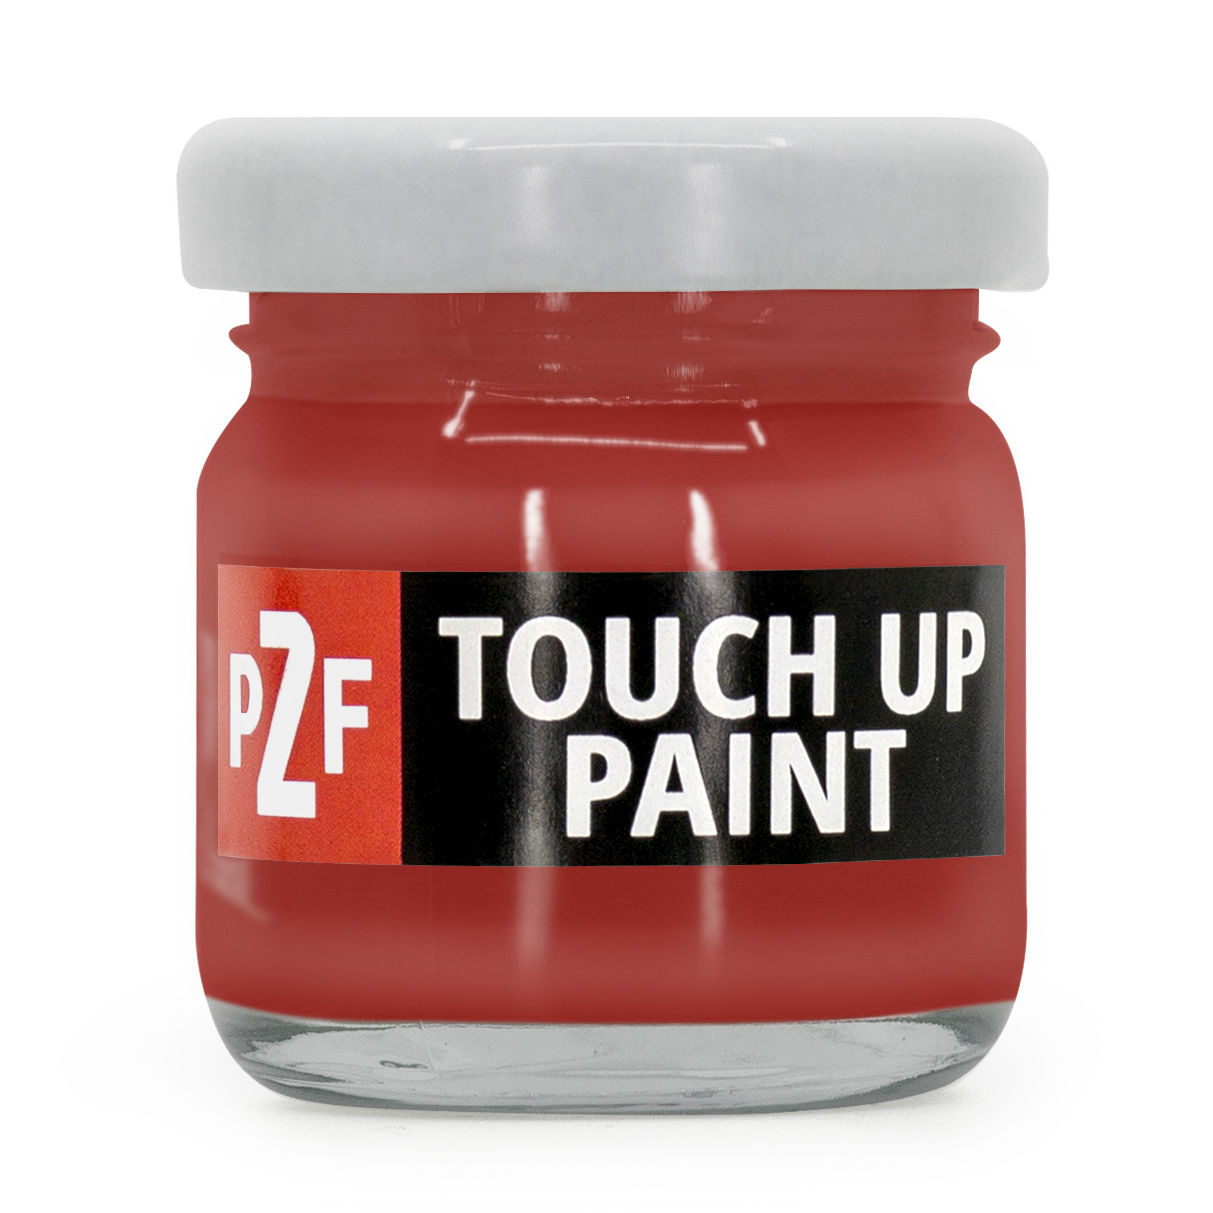 Ferrari Rosso Corsa 322 Touch Up Paint | Rosso Corsa Scratch Repair | 322 Paint Repair Kit